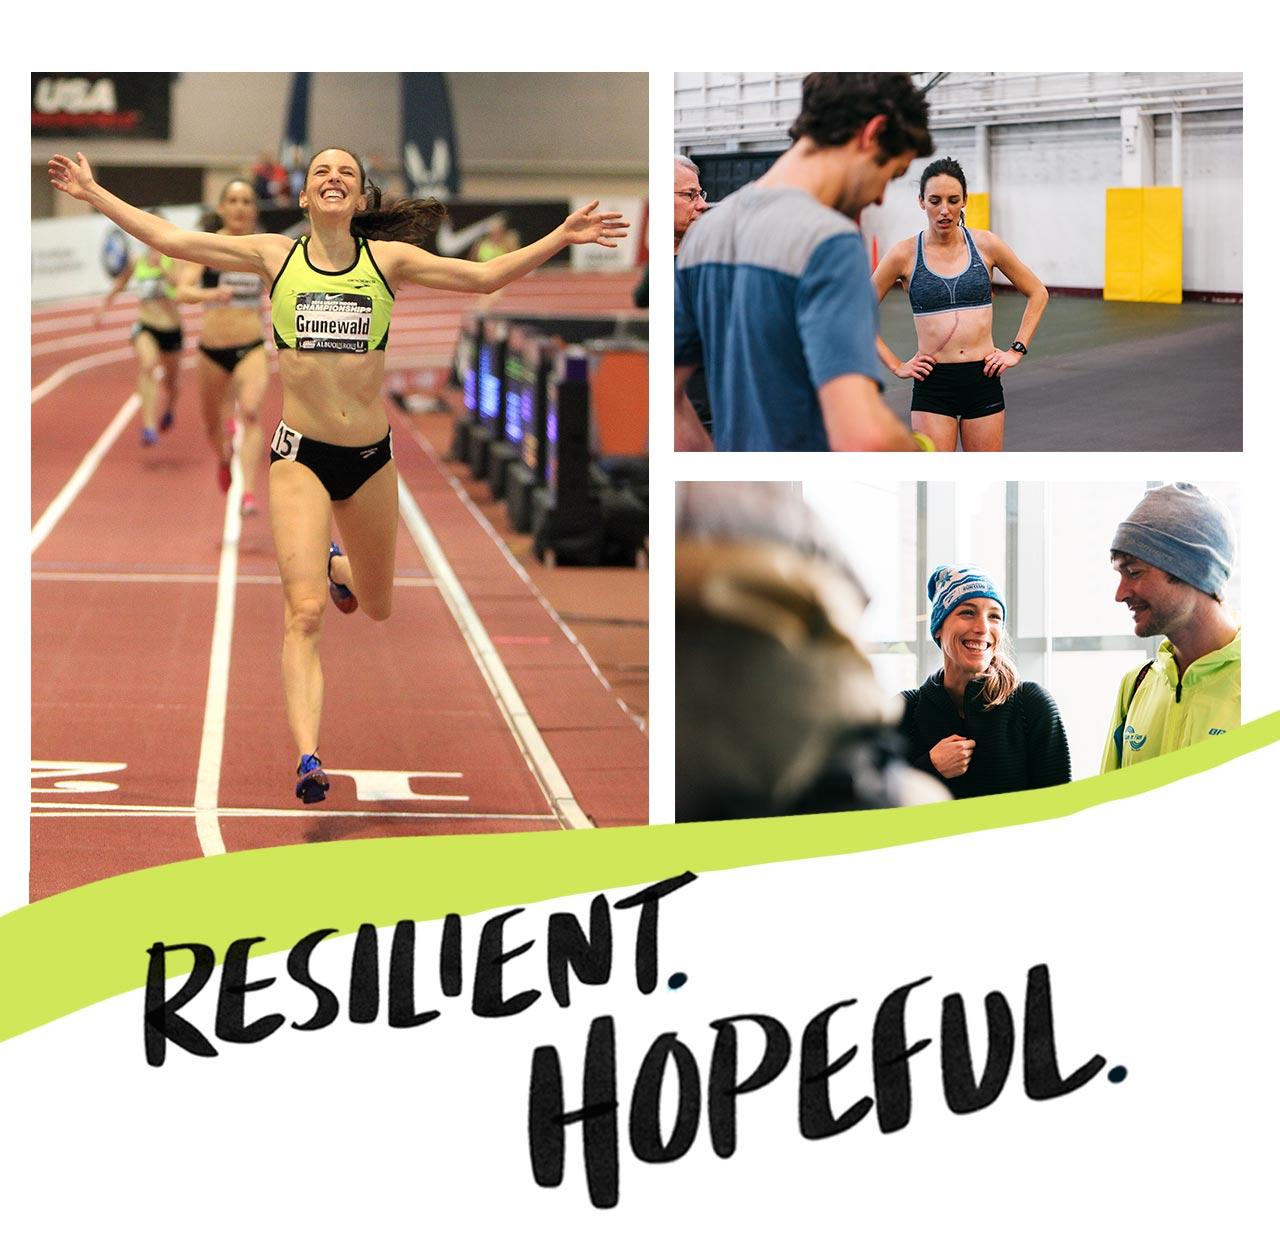 Resilient. Hopeful.